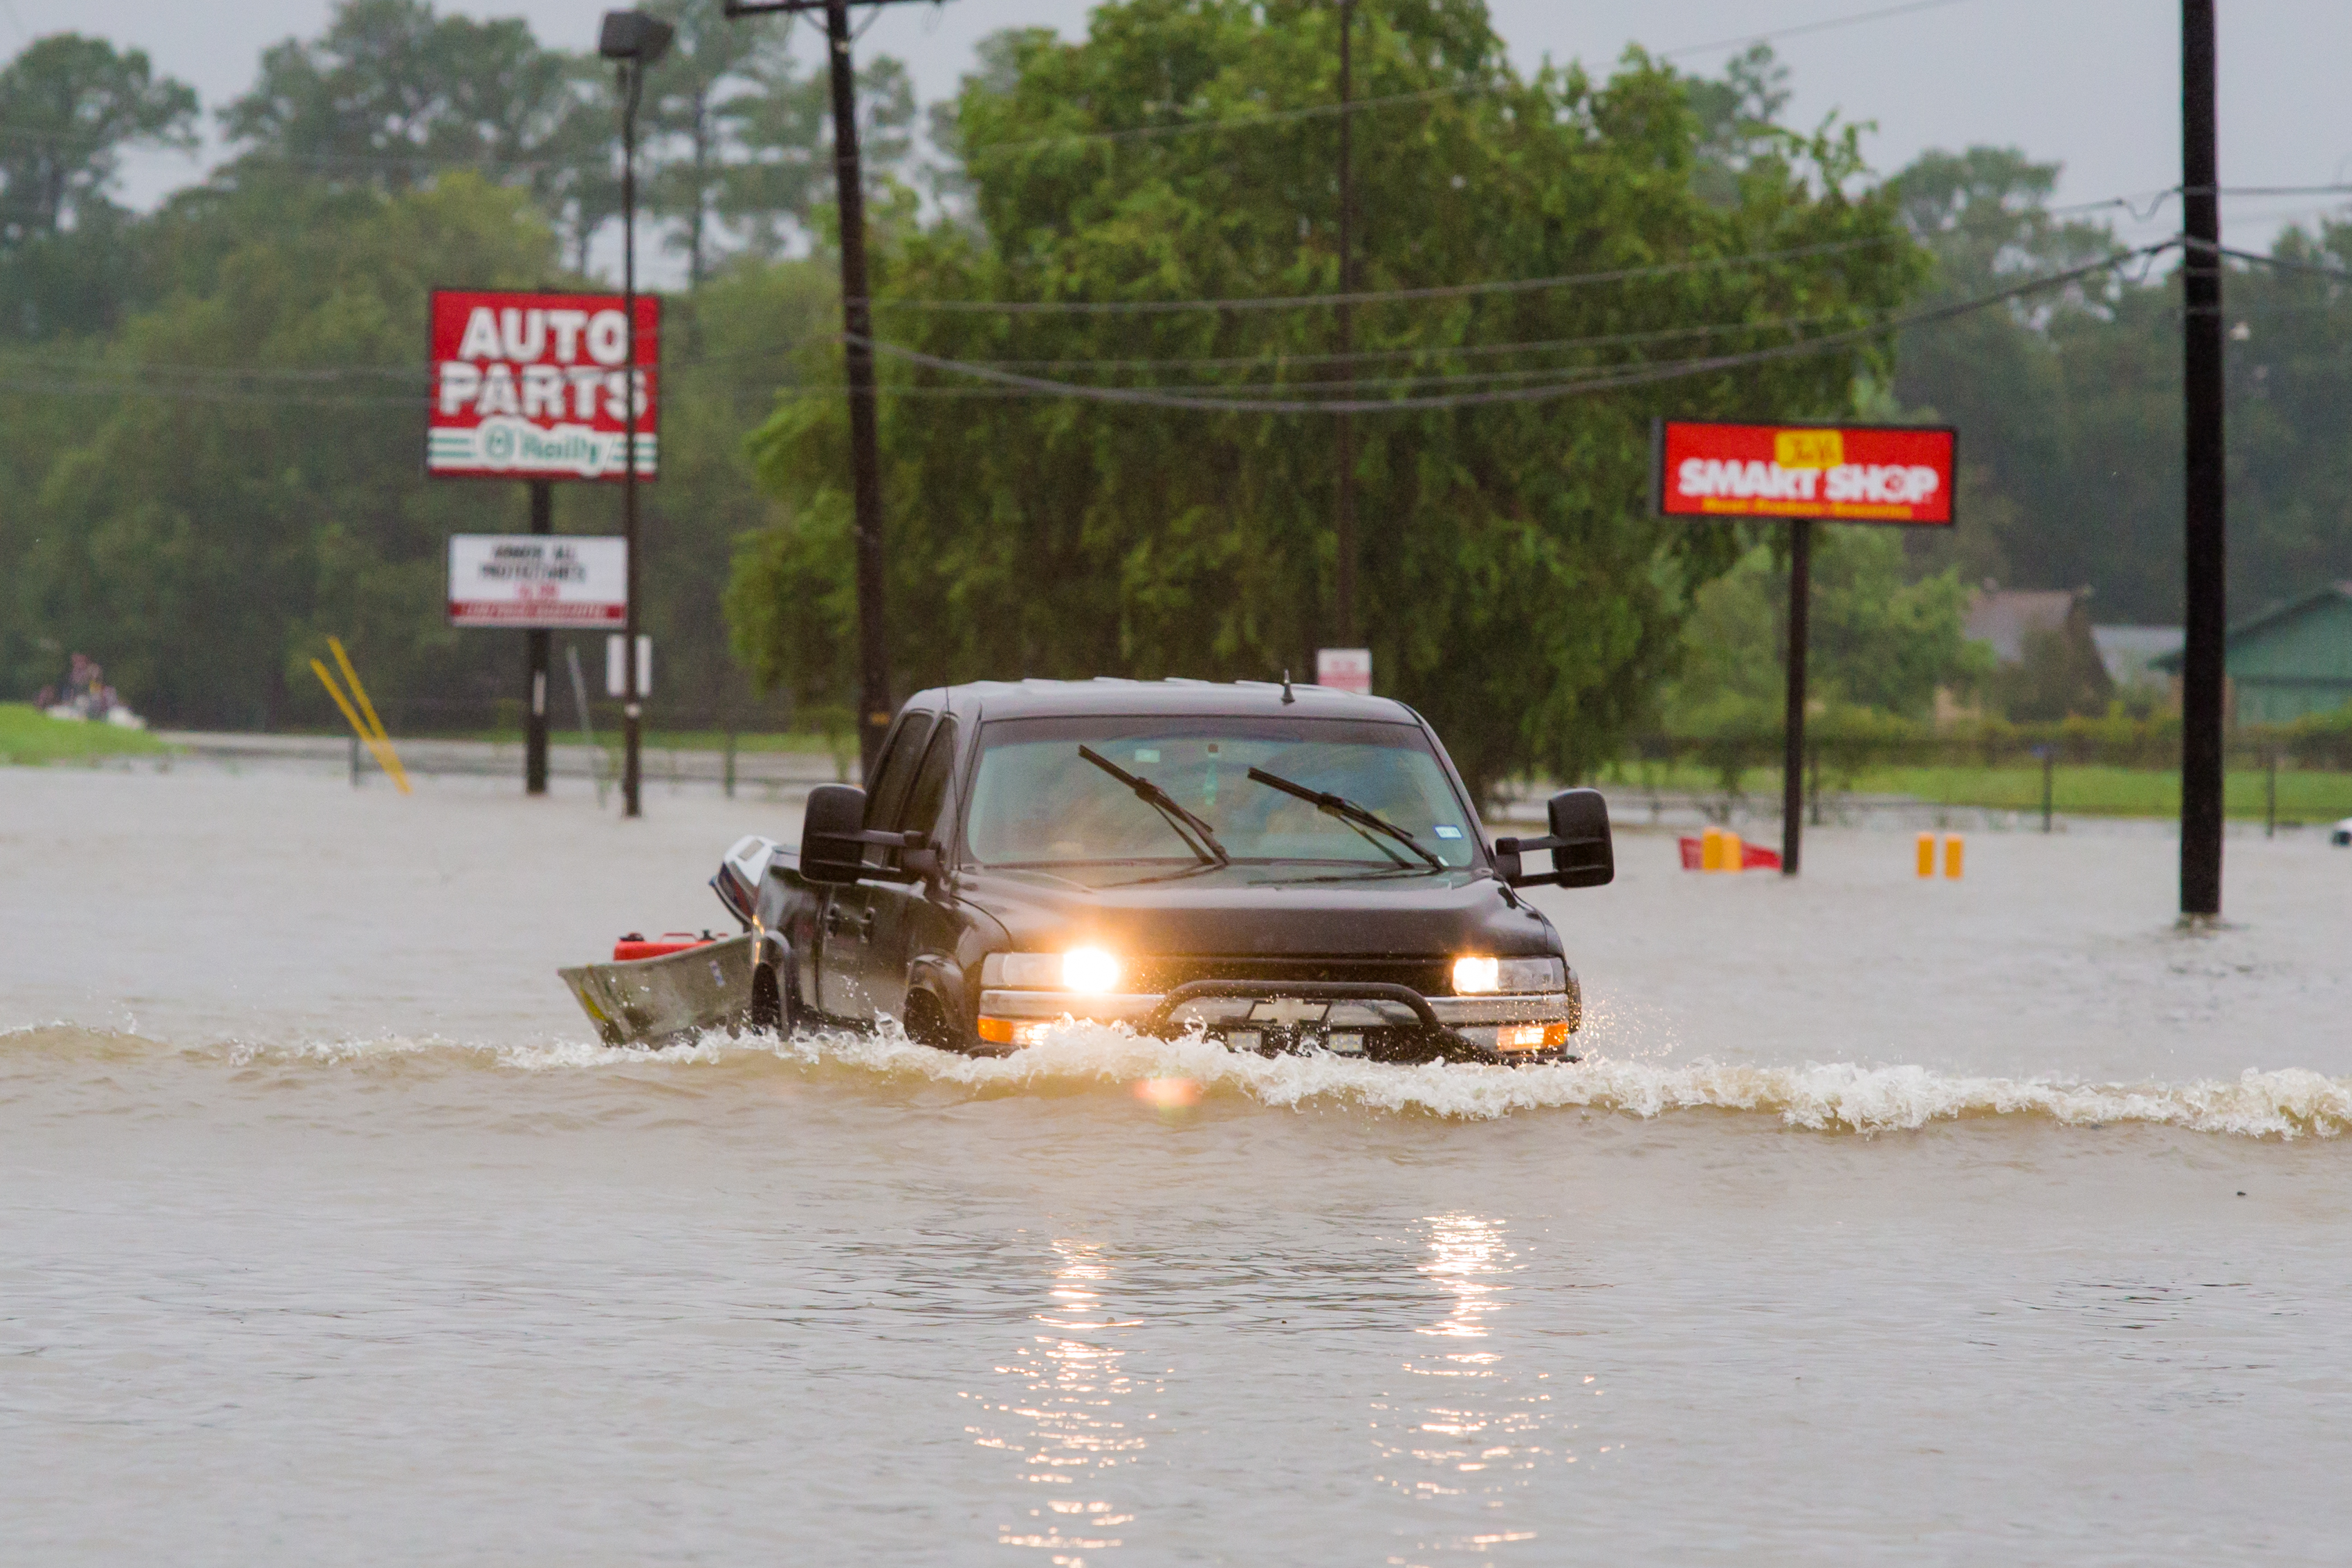 NEWS: AUG 28 Hurricane Harvey